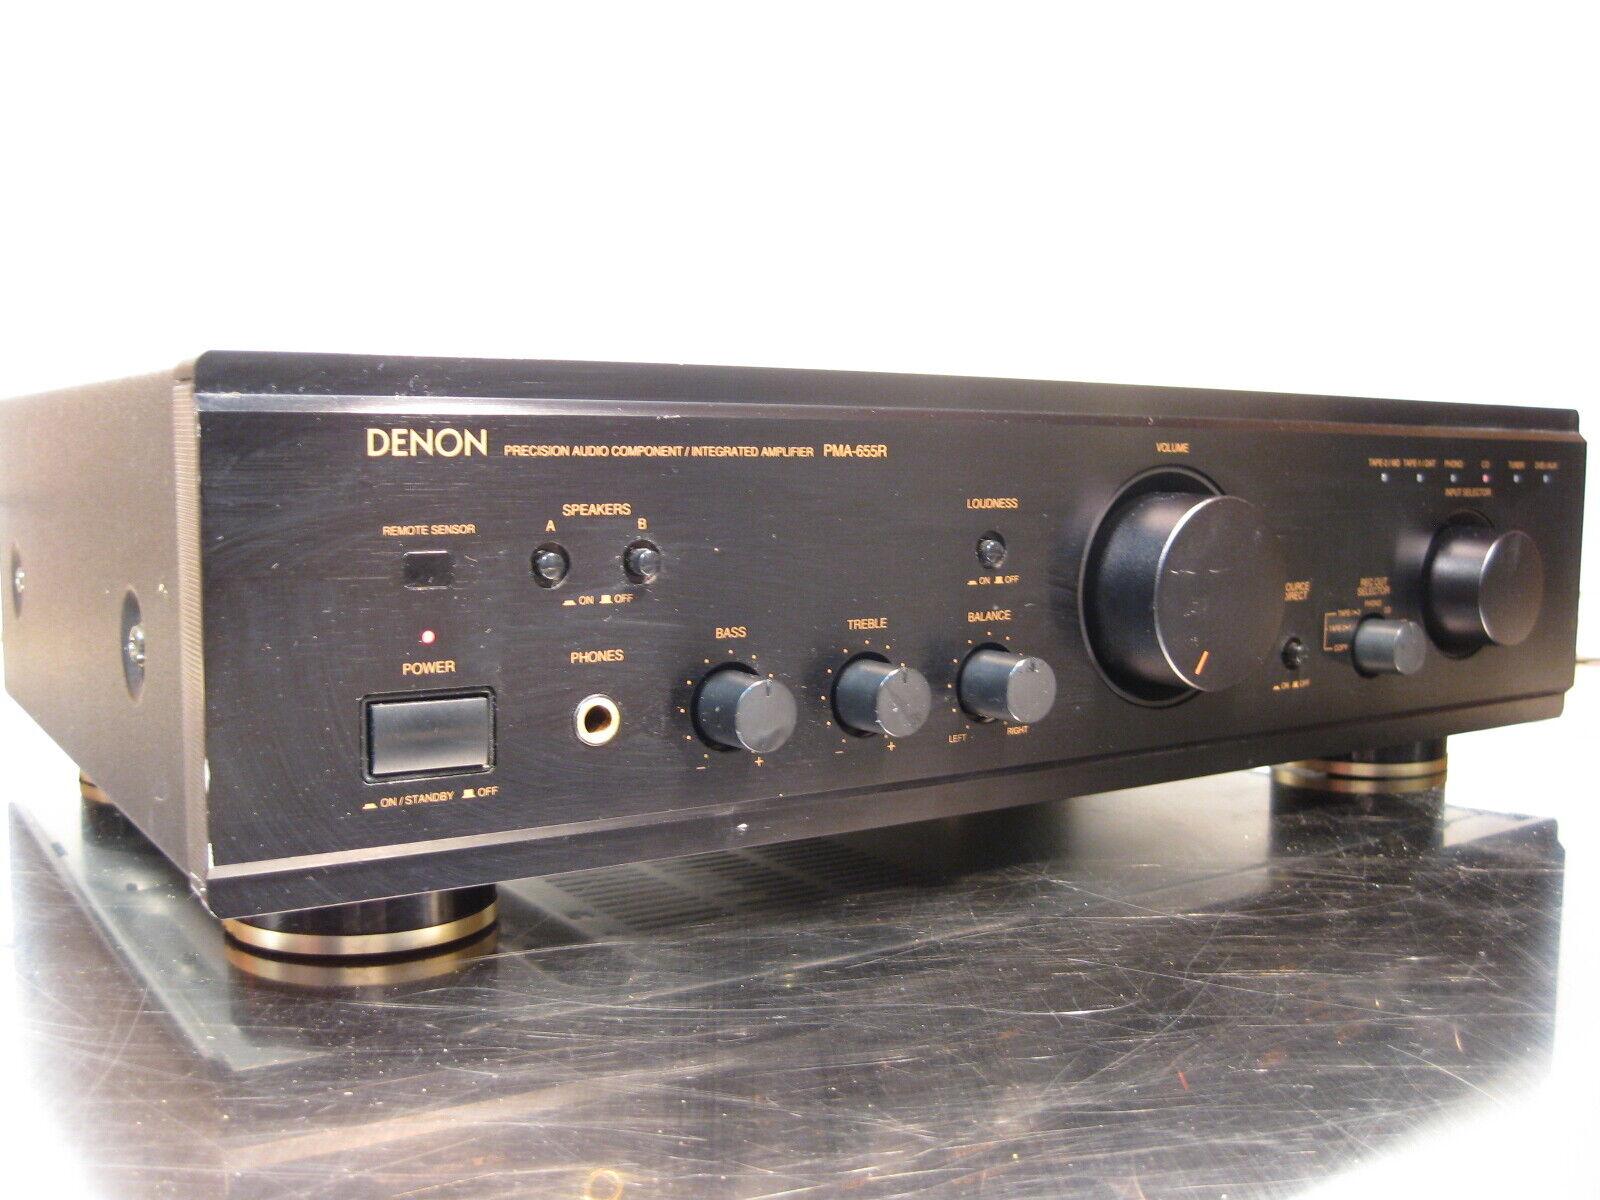 Denon pma-655r amplificateur amplifier ampli verstaker no remote.